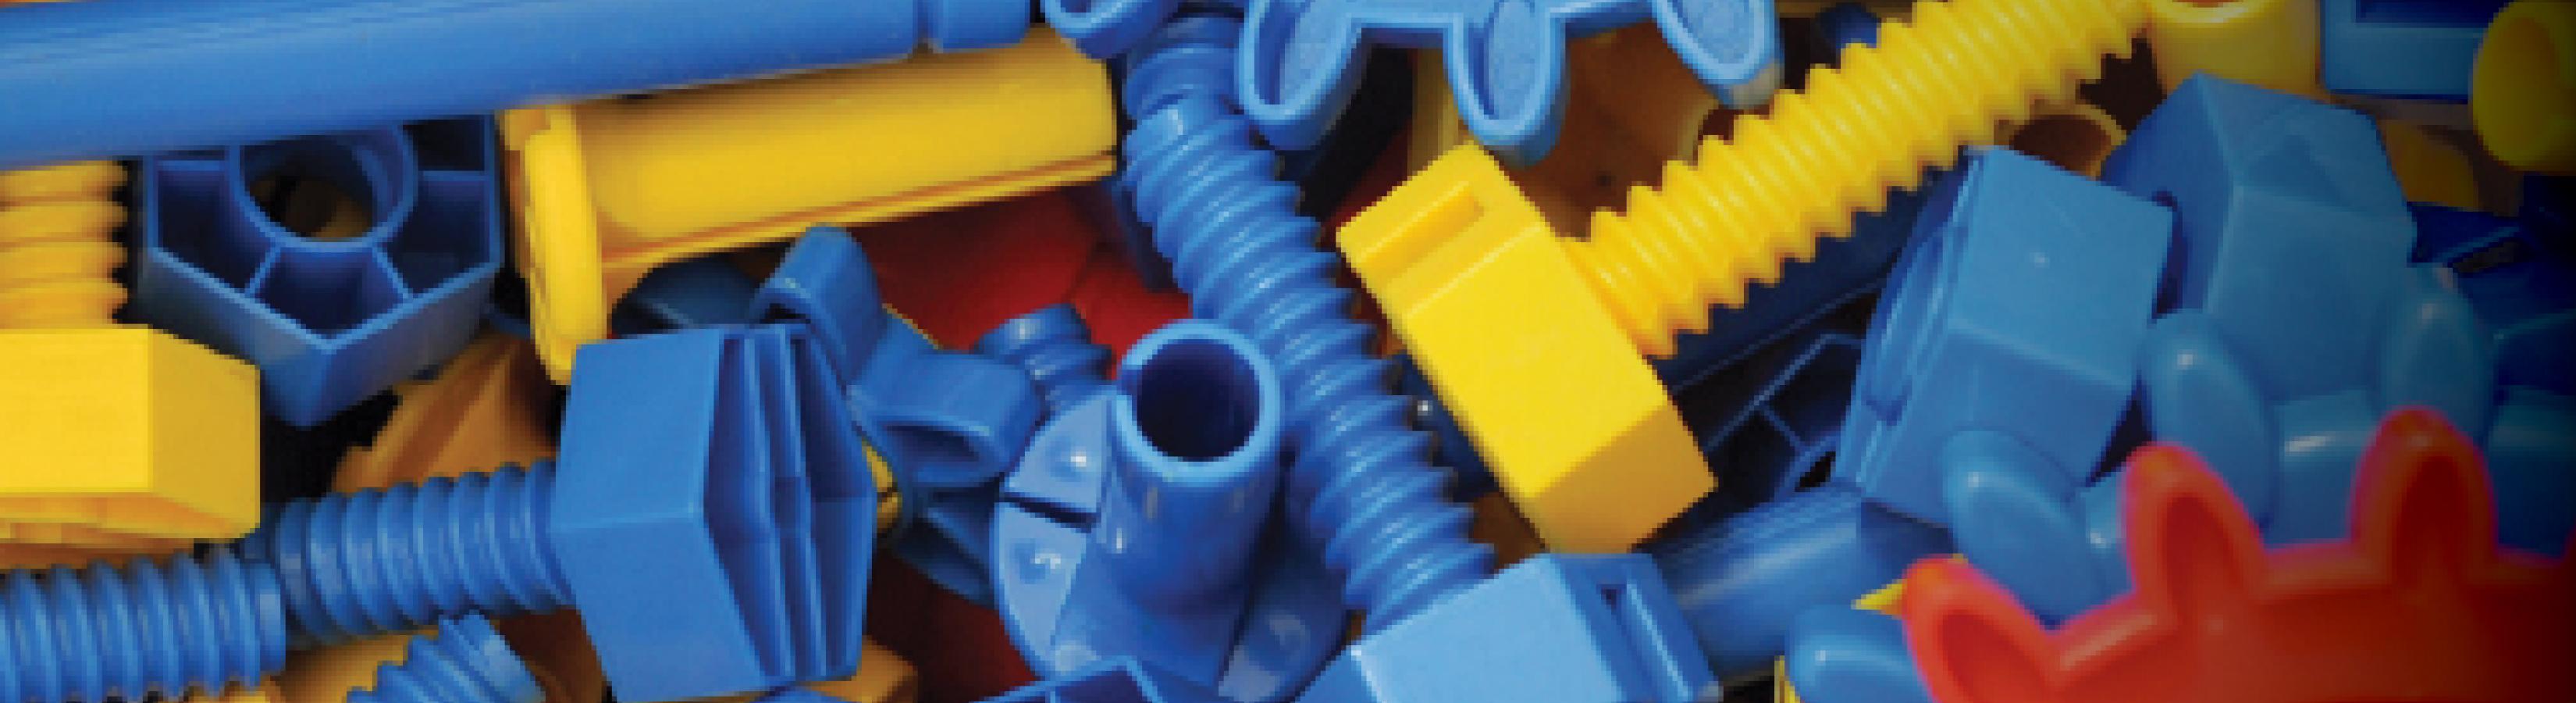 Robotic LEGO Photocopier: SolidWorks Design En Route